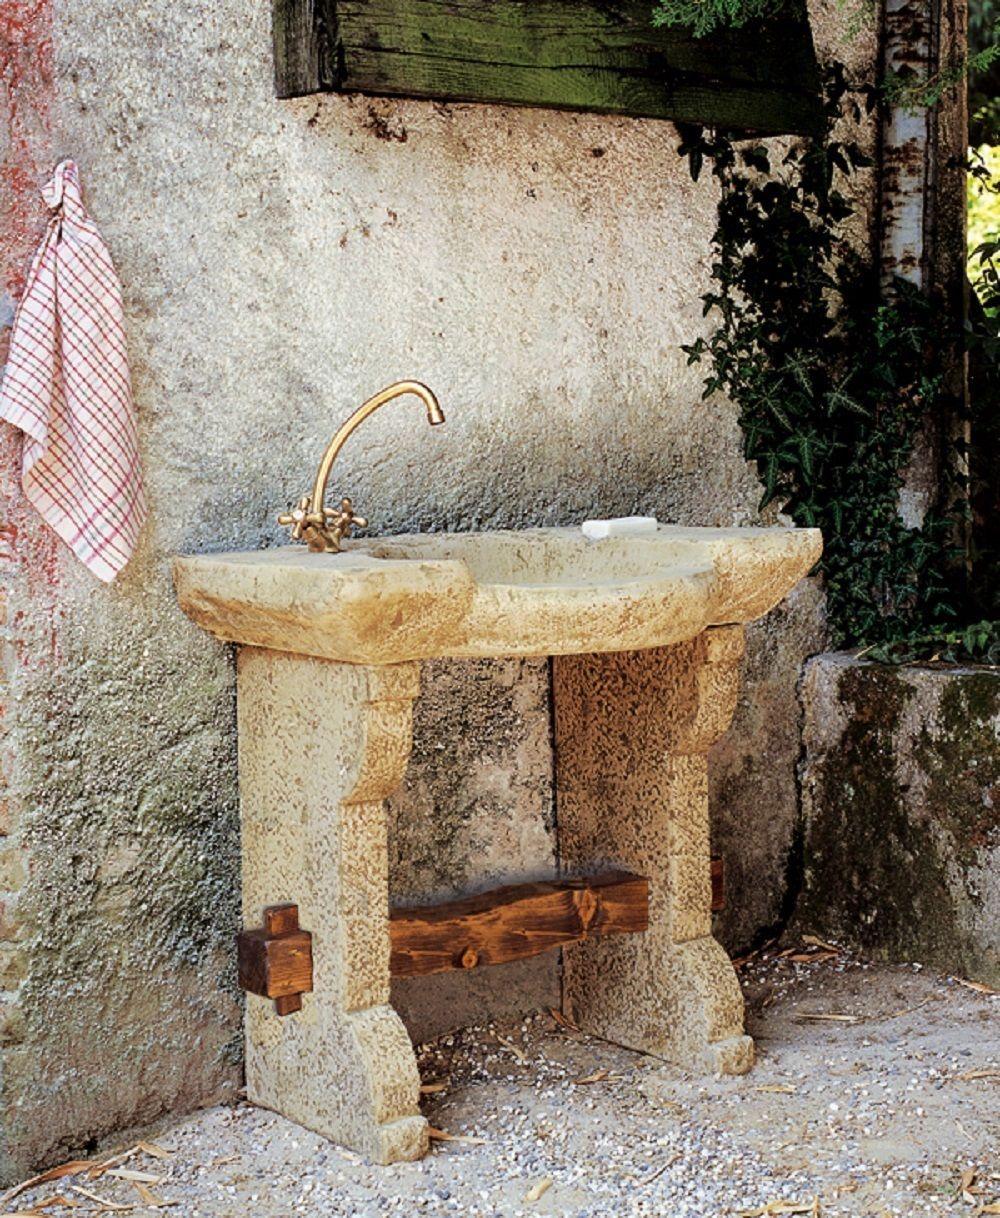 Dekoration Brunnen Springbrunnen Garten Etagenbrunnen Wandbrunnen Ebay Springbrunnen Garten Wandbrunnen Springbrunnen